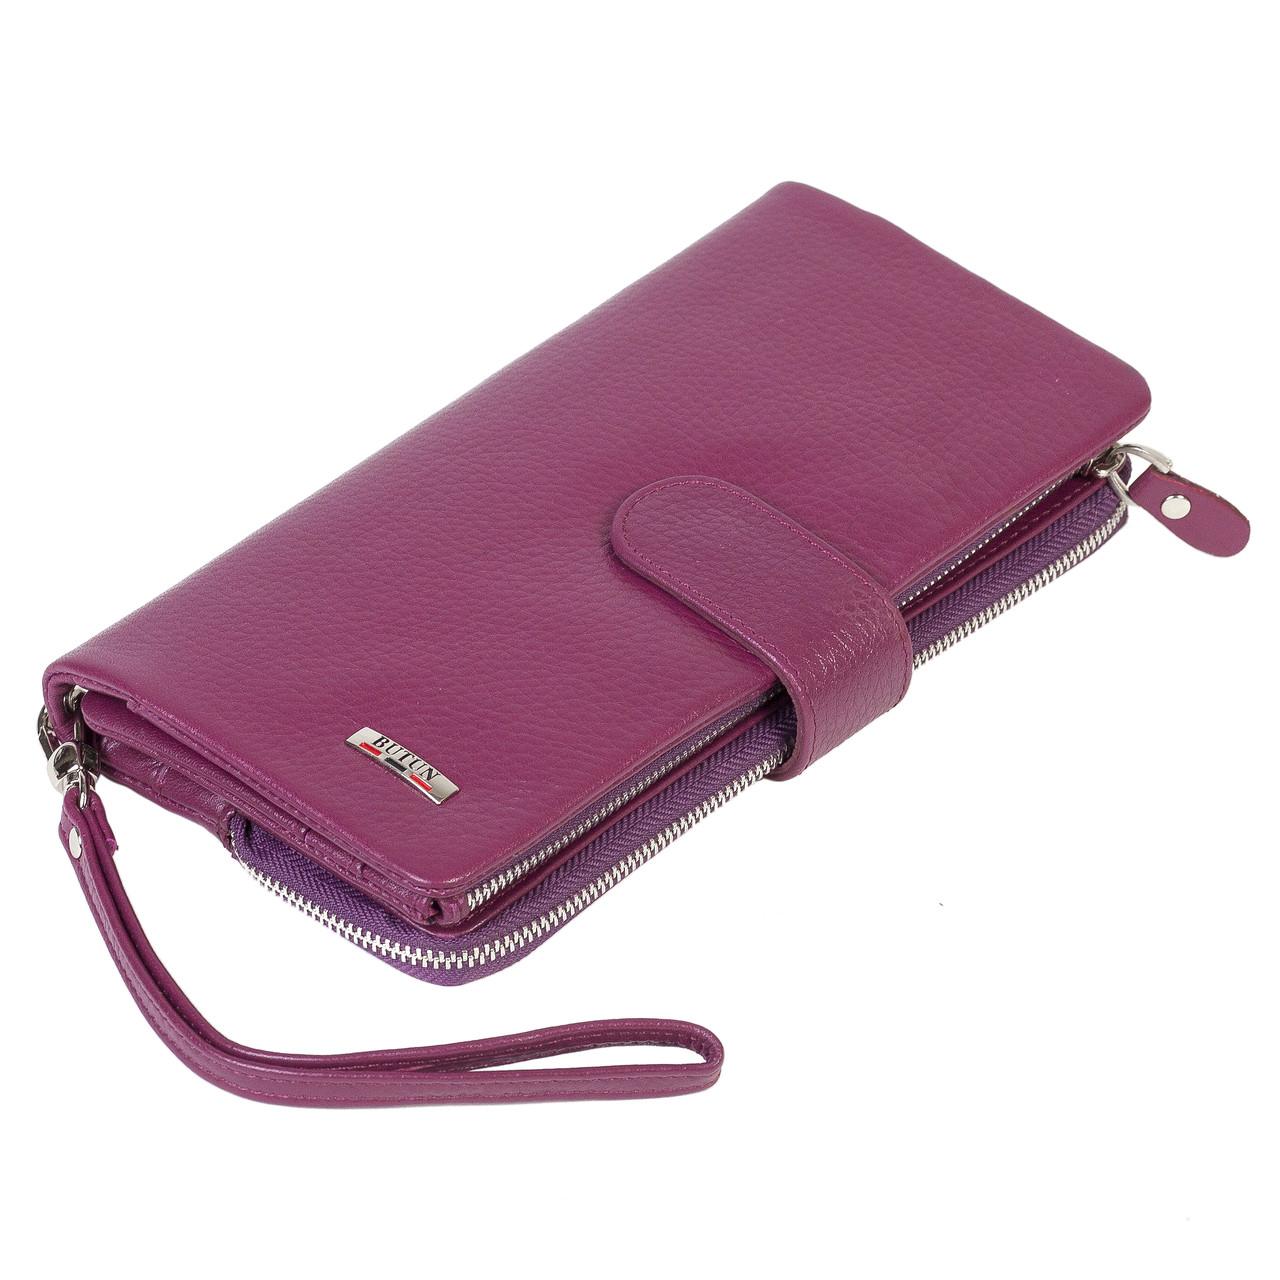 Женский кошелек клатч BUTUN 022-004-005 кожаный марсала